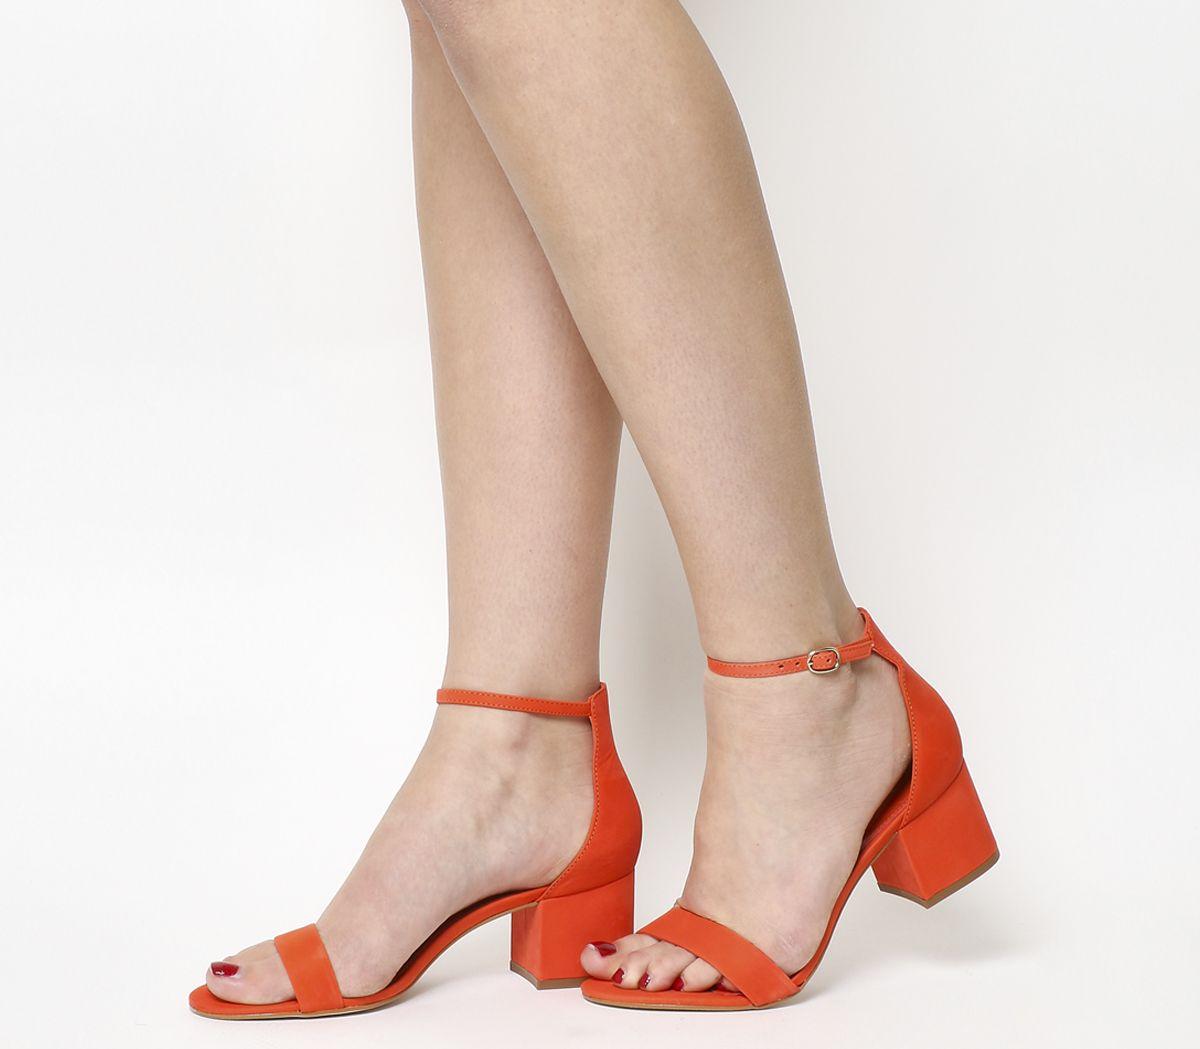 fb6be157966 Office Finley Block Heel Sandals Bright Red Nubuck - Mid Heels